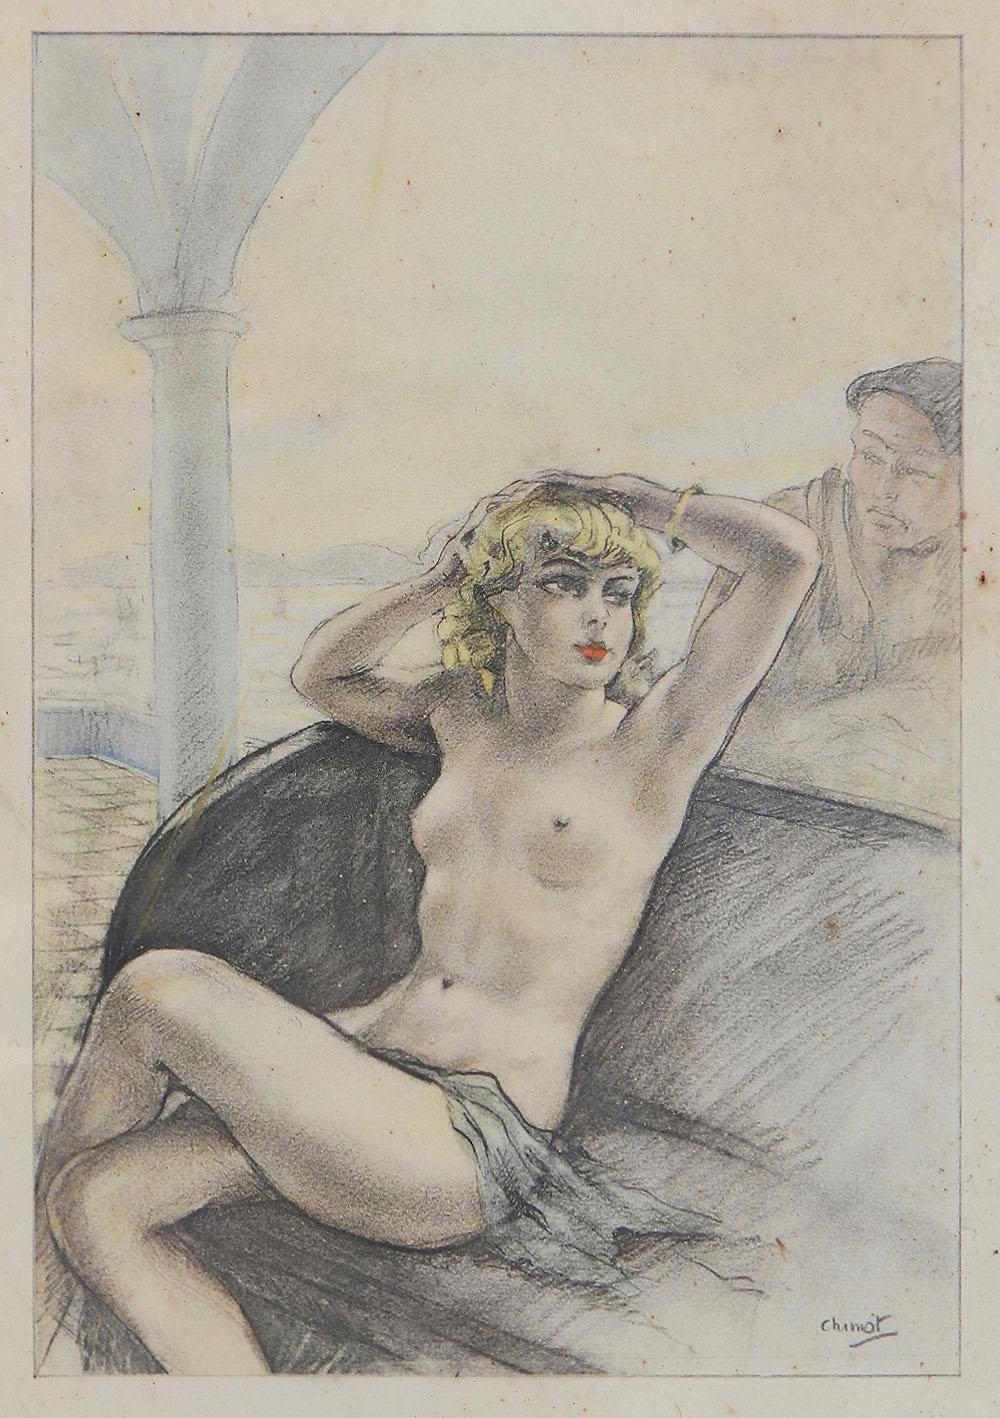 Edouard Chimot Nude Lithograph Print c1936 Art Deco Erotica